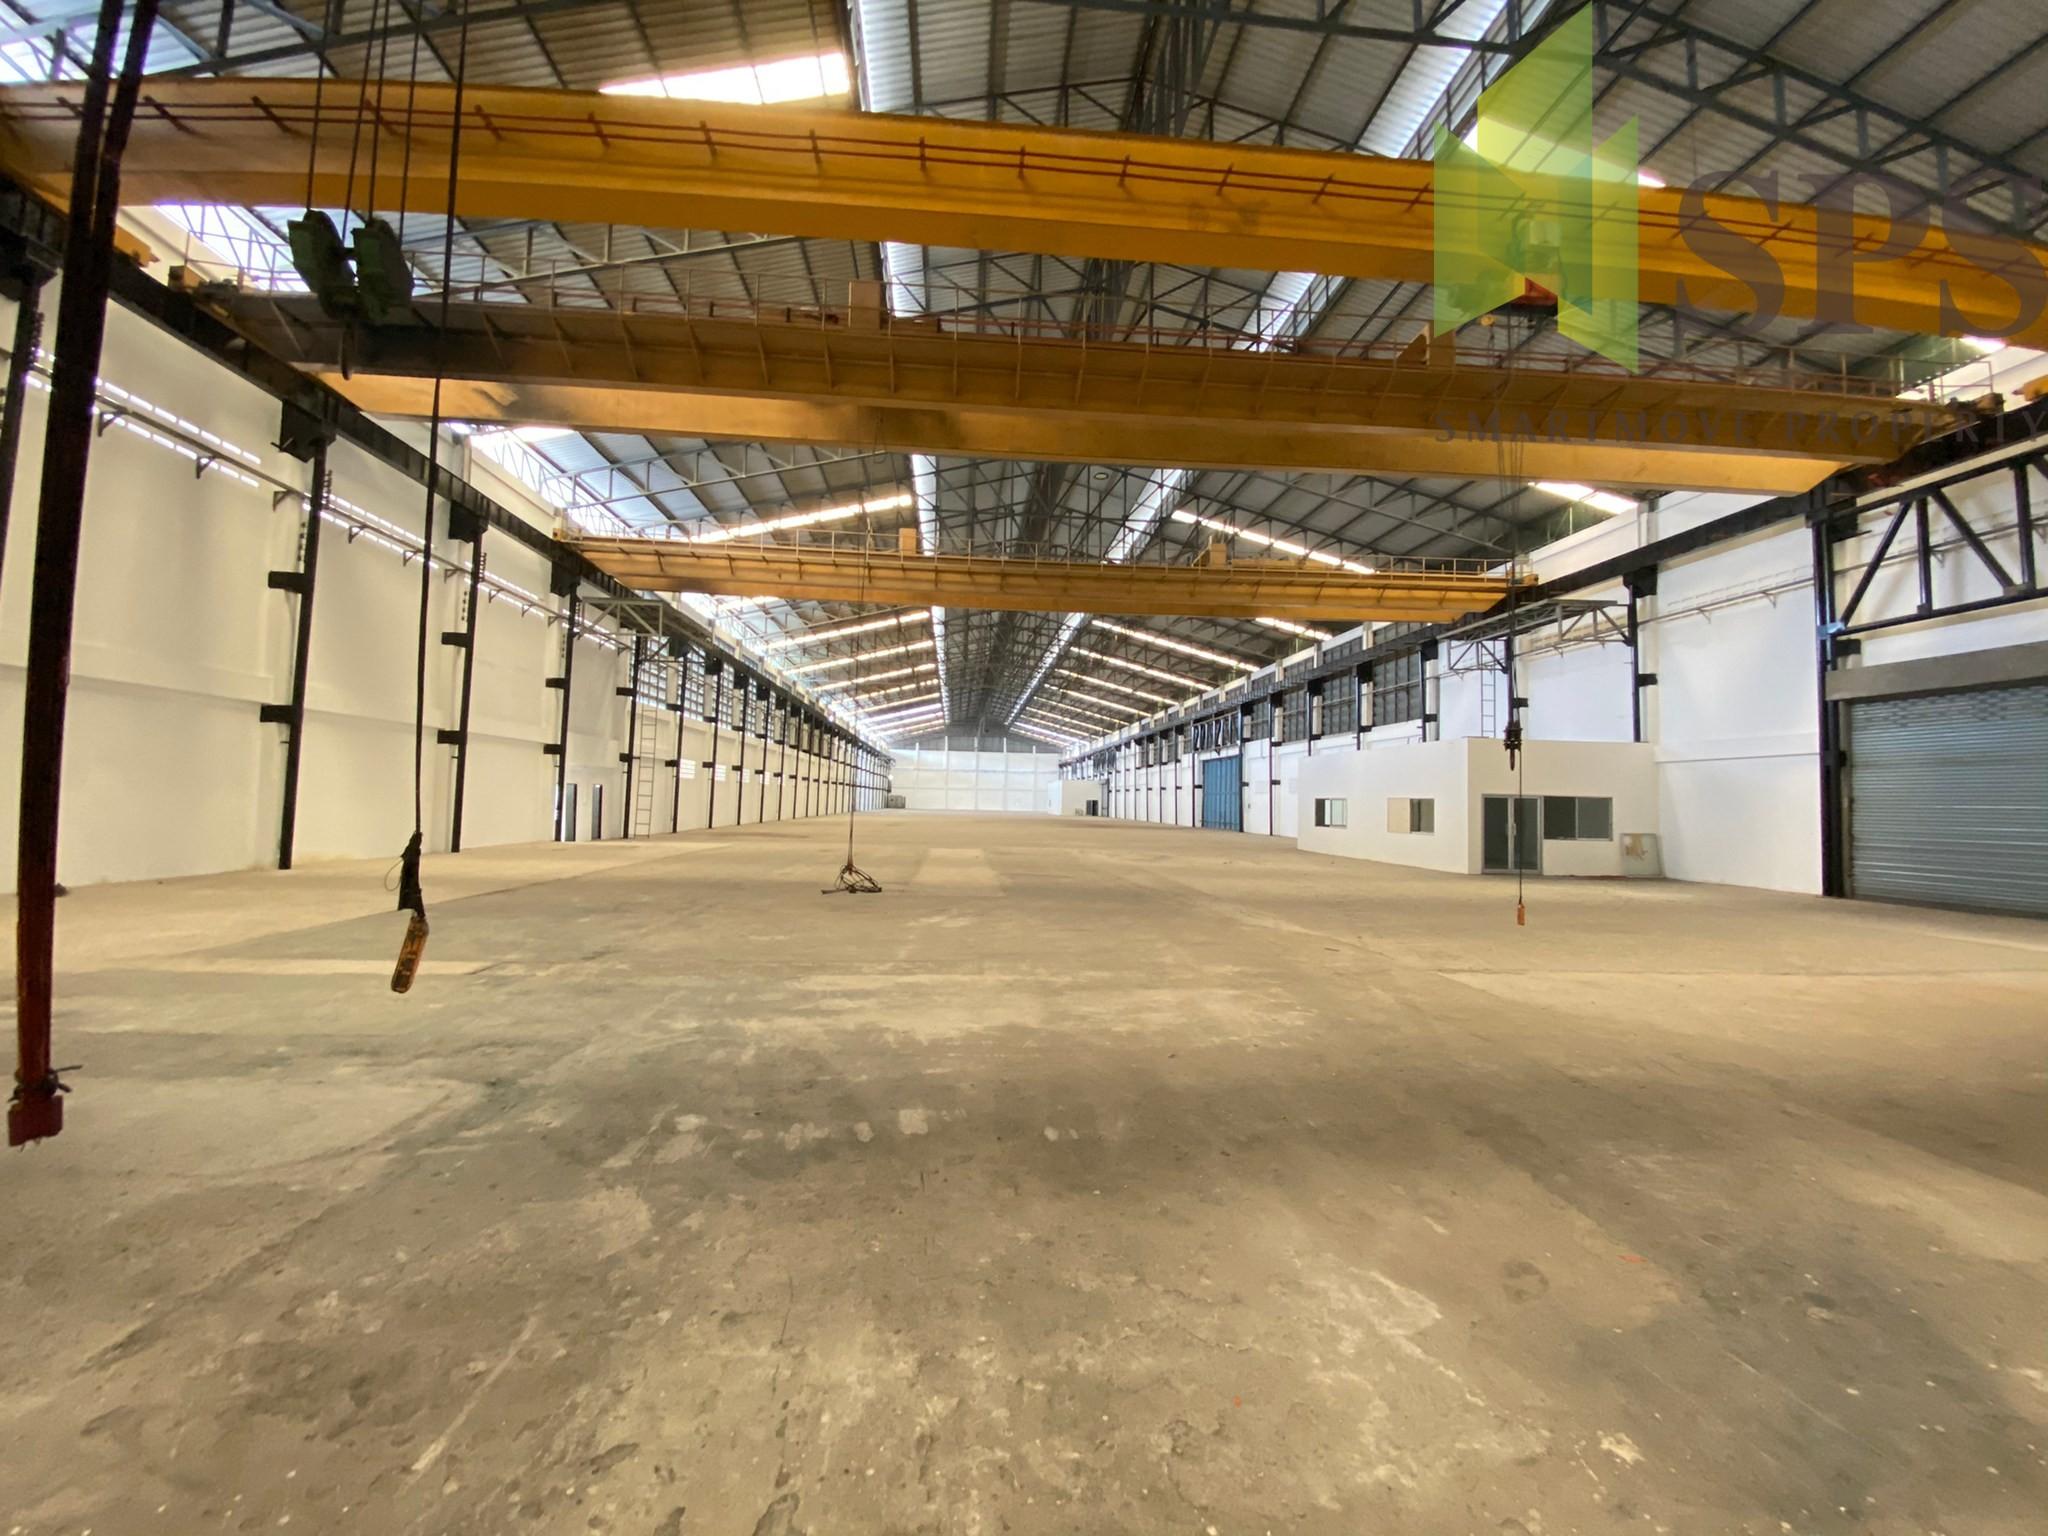 Factory, Warehouse with Kran 5 Tons for RENT at BangPlee-Tamru / โกดัง, โรงงาน พร้อม เครนรับน้ำหนัก 5 ตัน และสำนักงาน สำหรับเช่า ที่ บางพลี ตำหรุ (Property ID: SPS-PPW149)